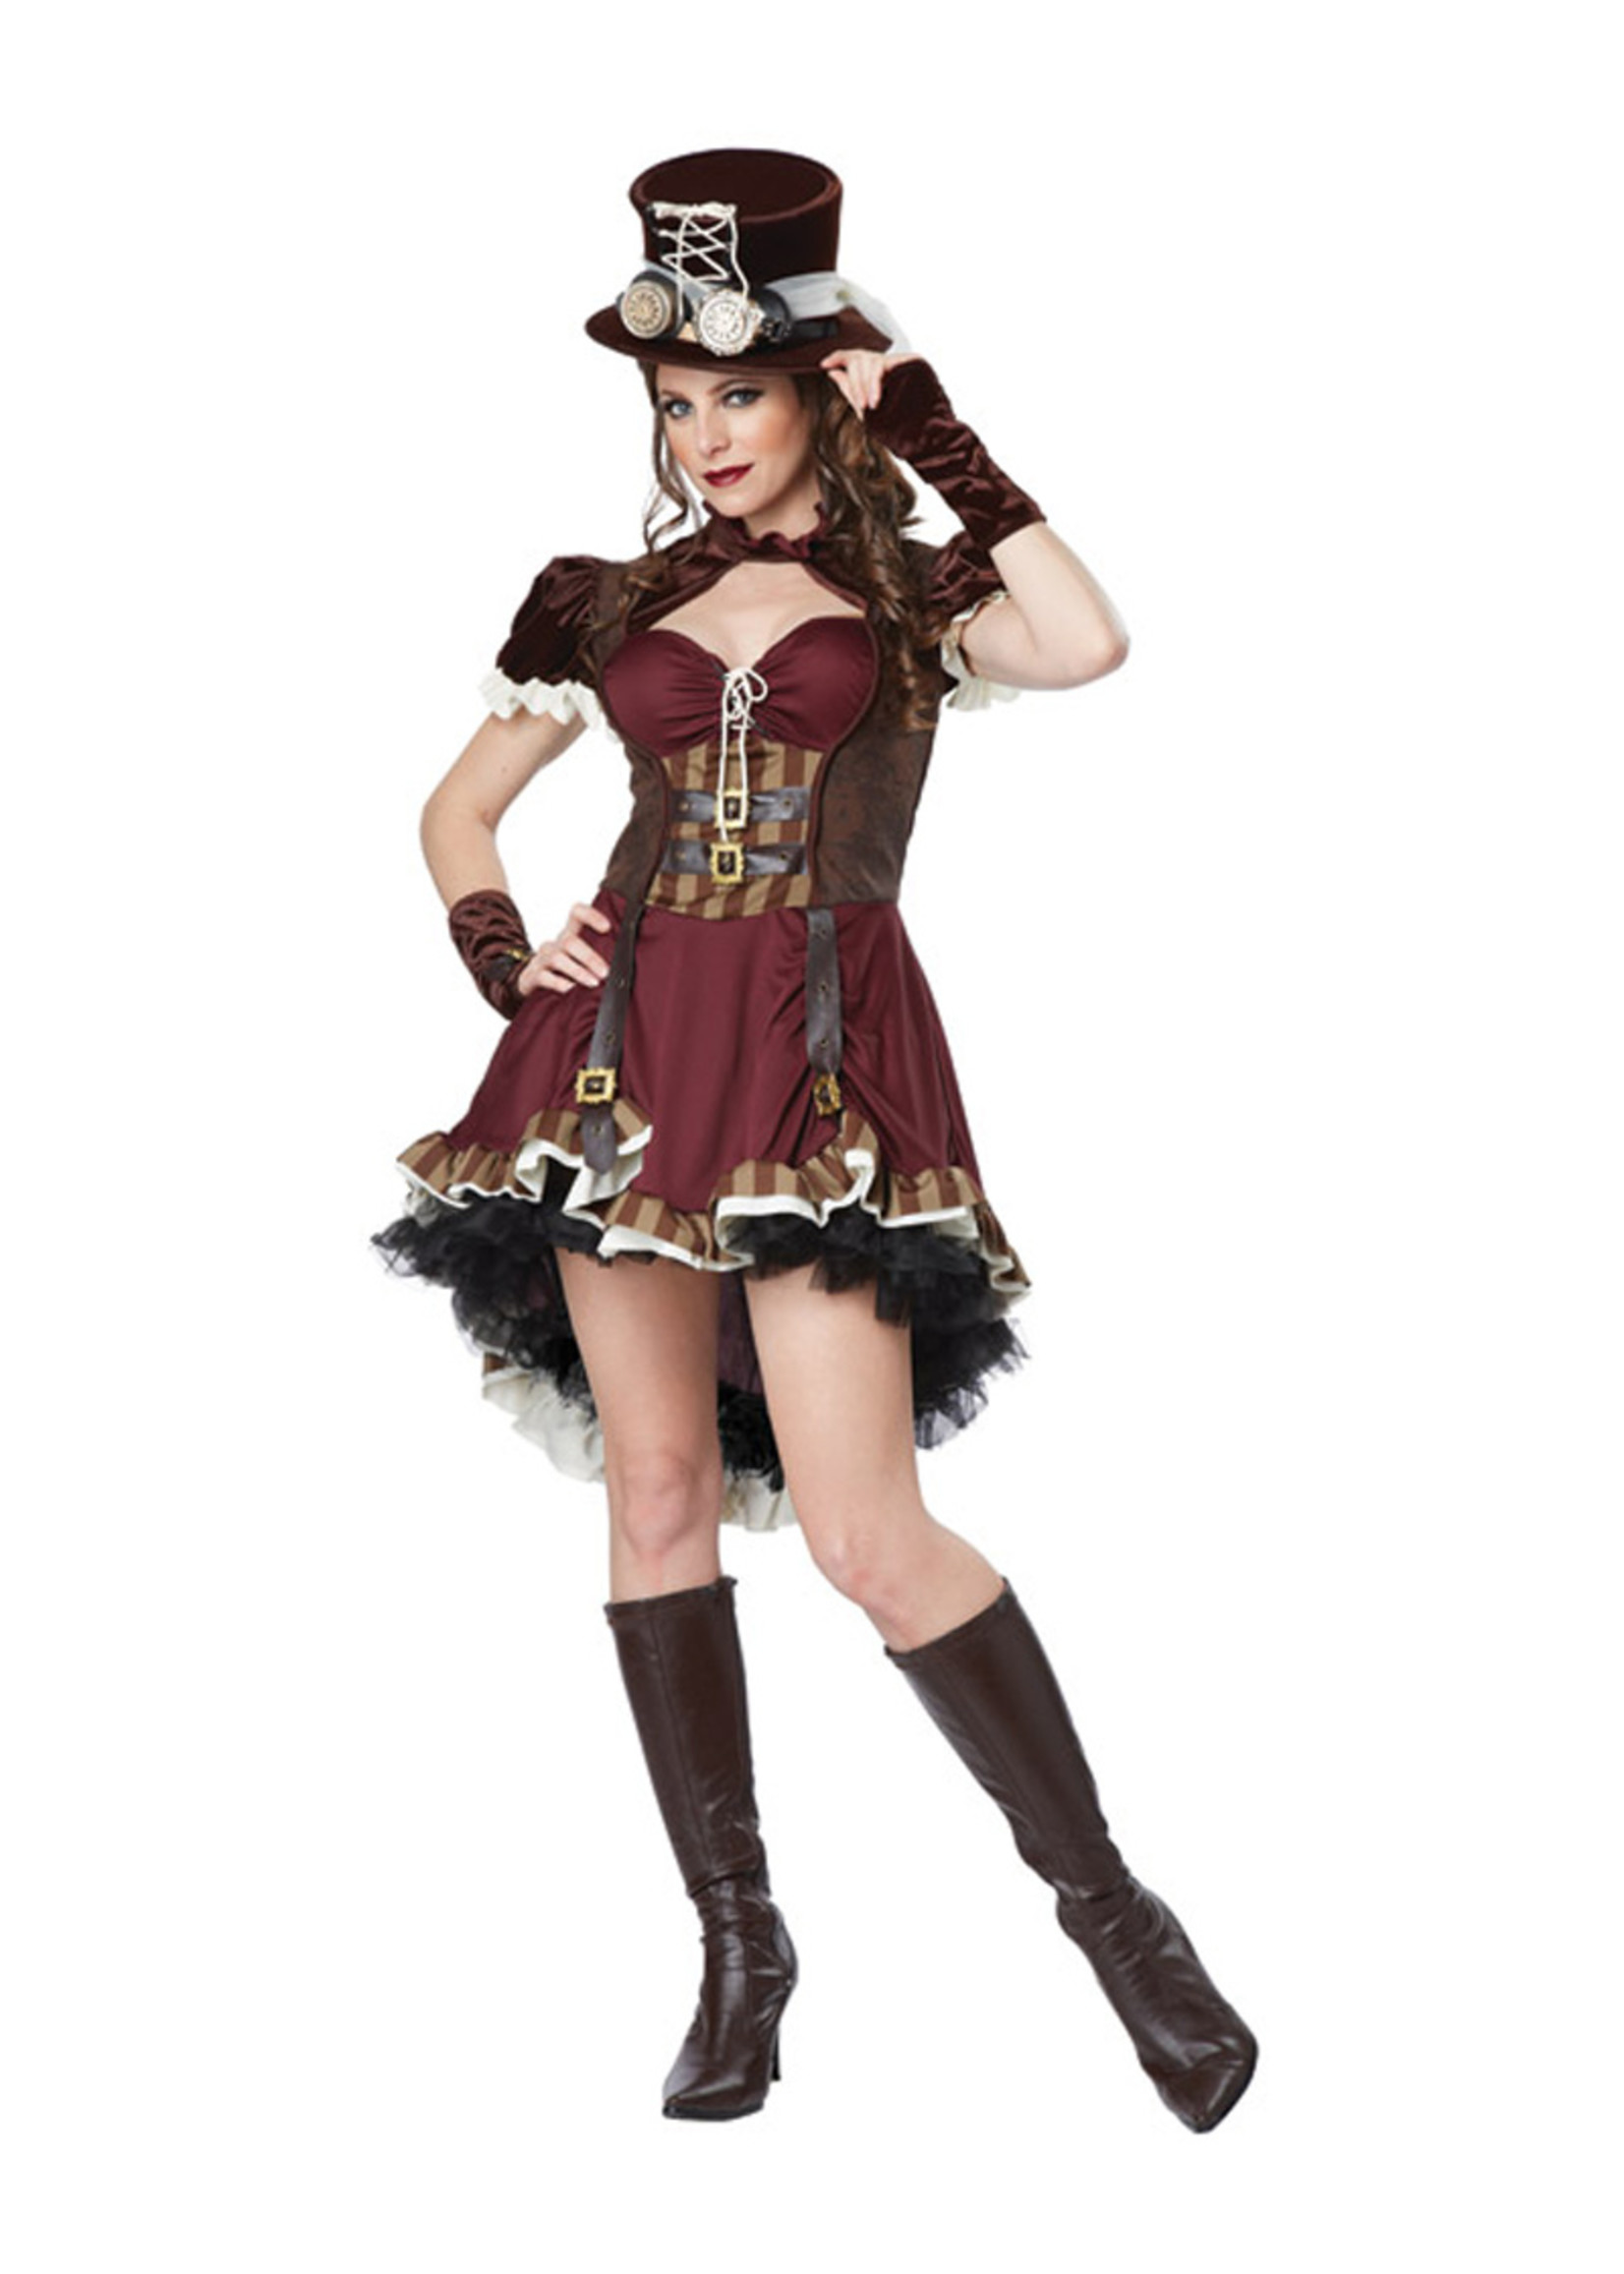 Steampunk Lady Costume - Women's